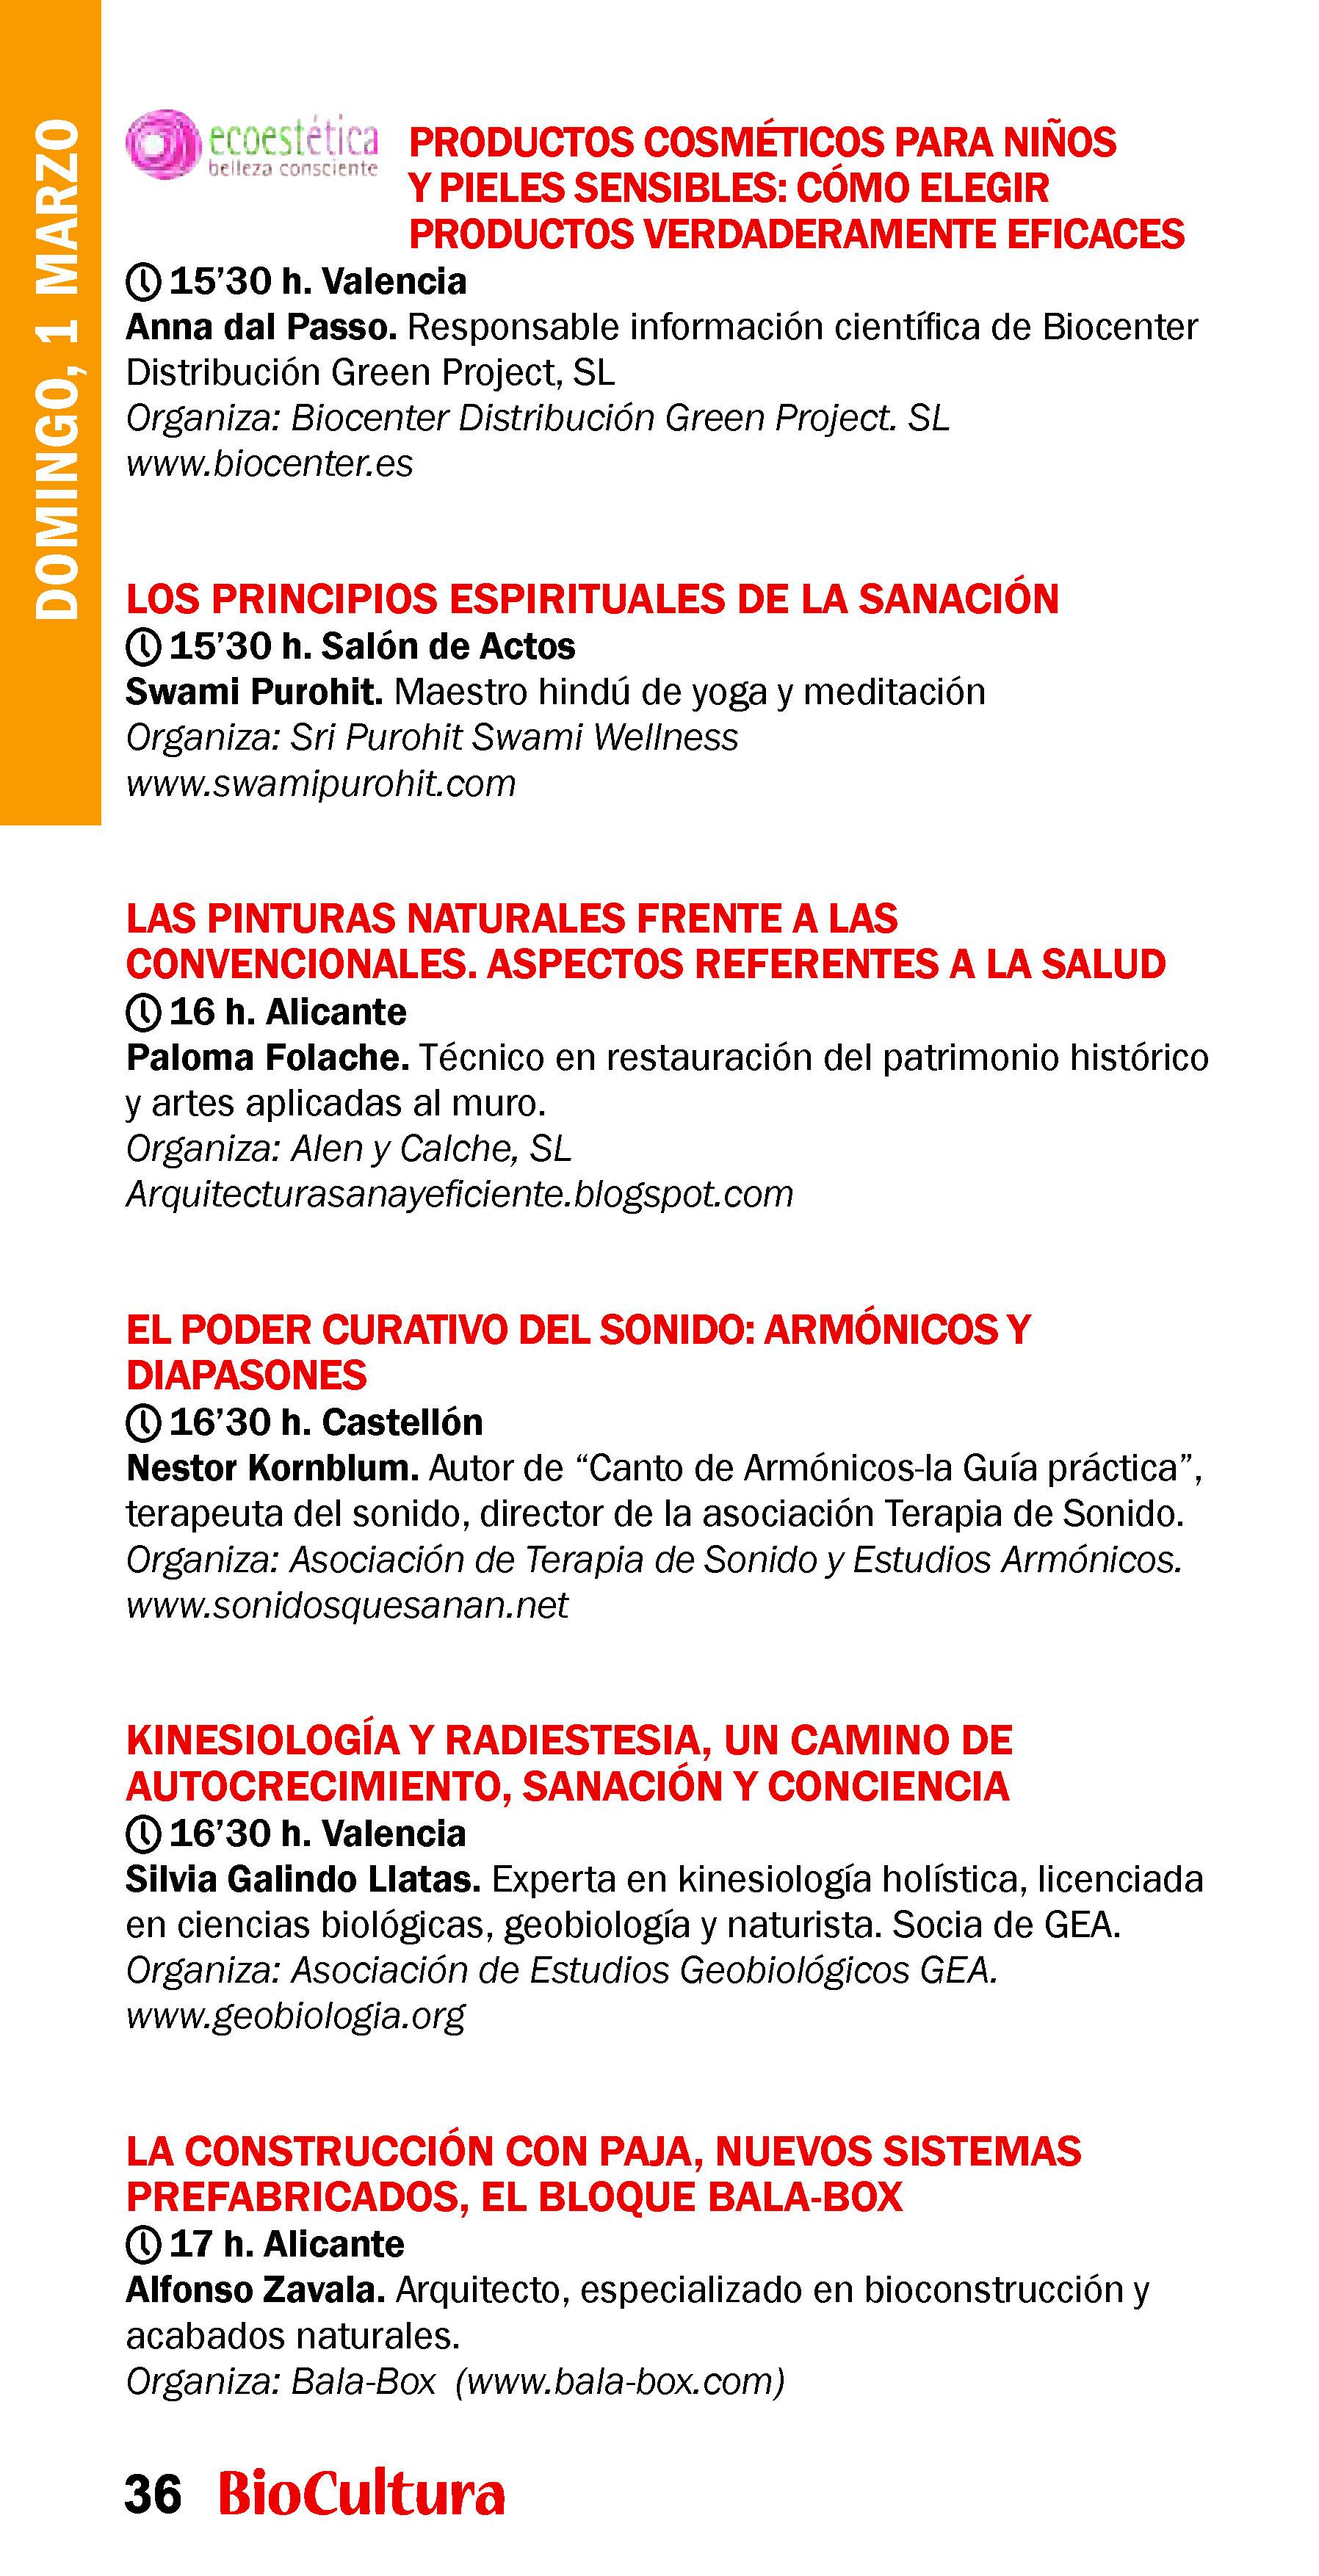 guia_actividades_BioCultura_Valencia_2015